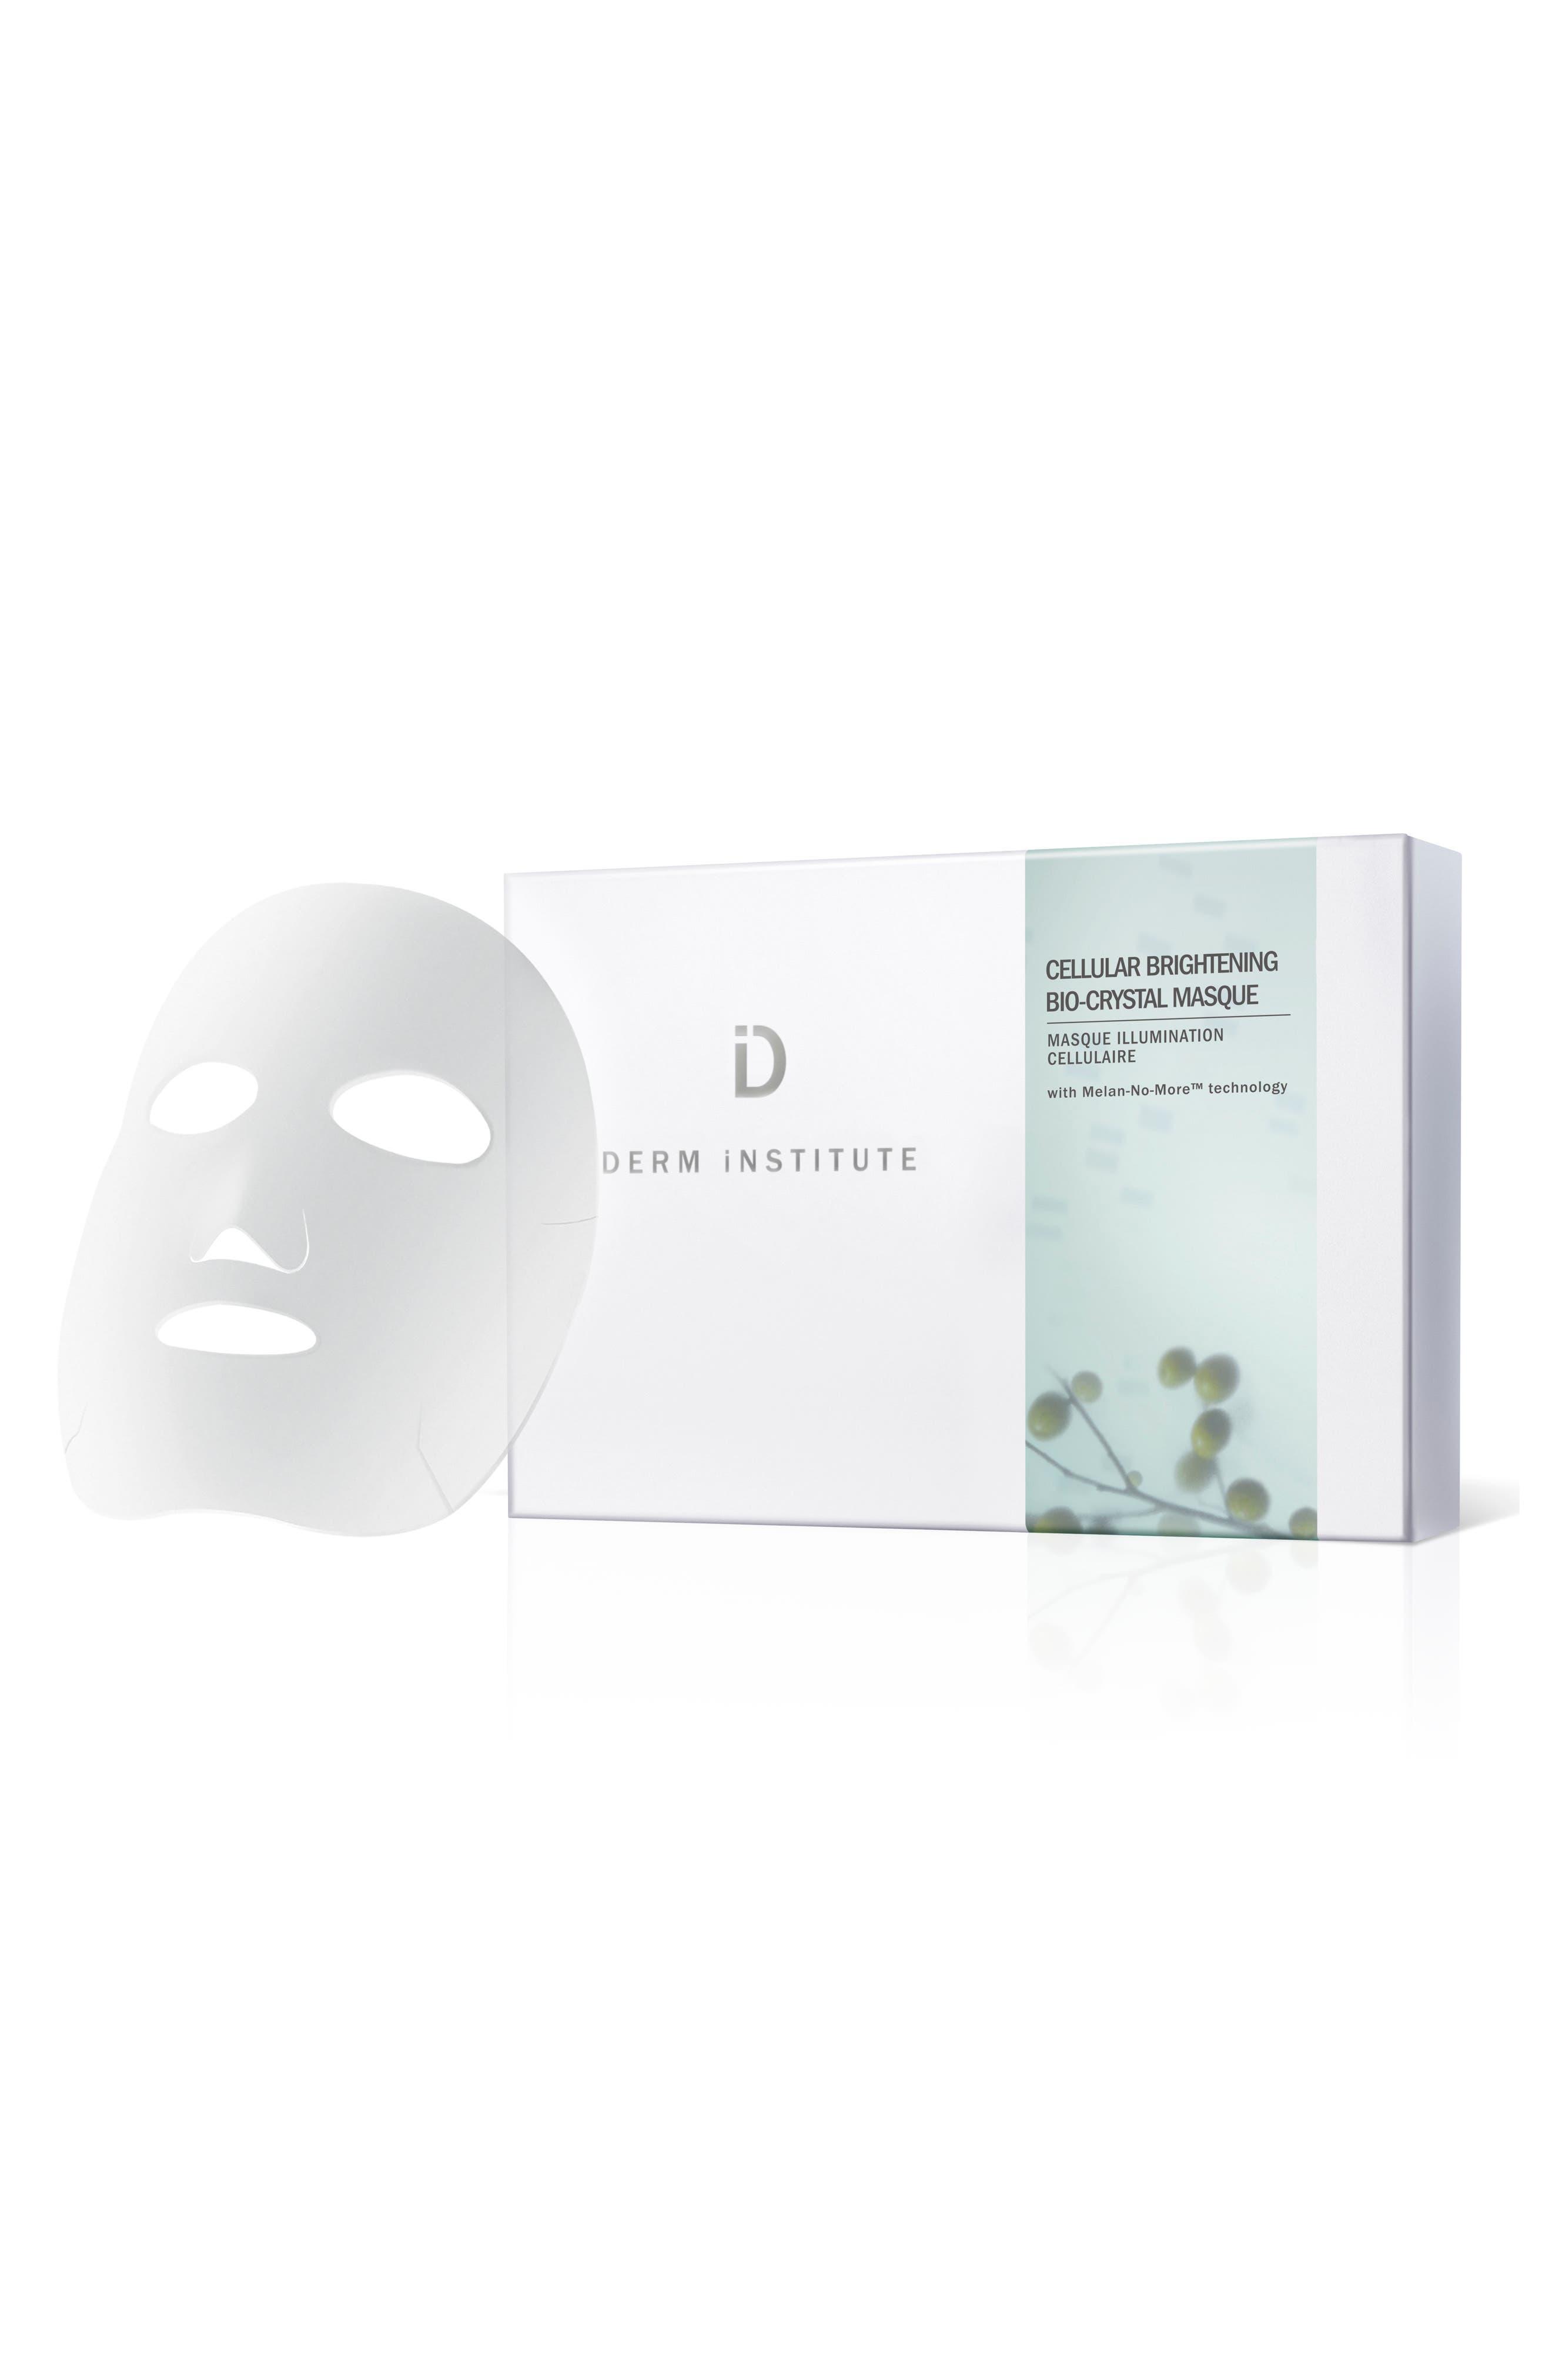 Cellular Brightening Bio-Crystal Masque